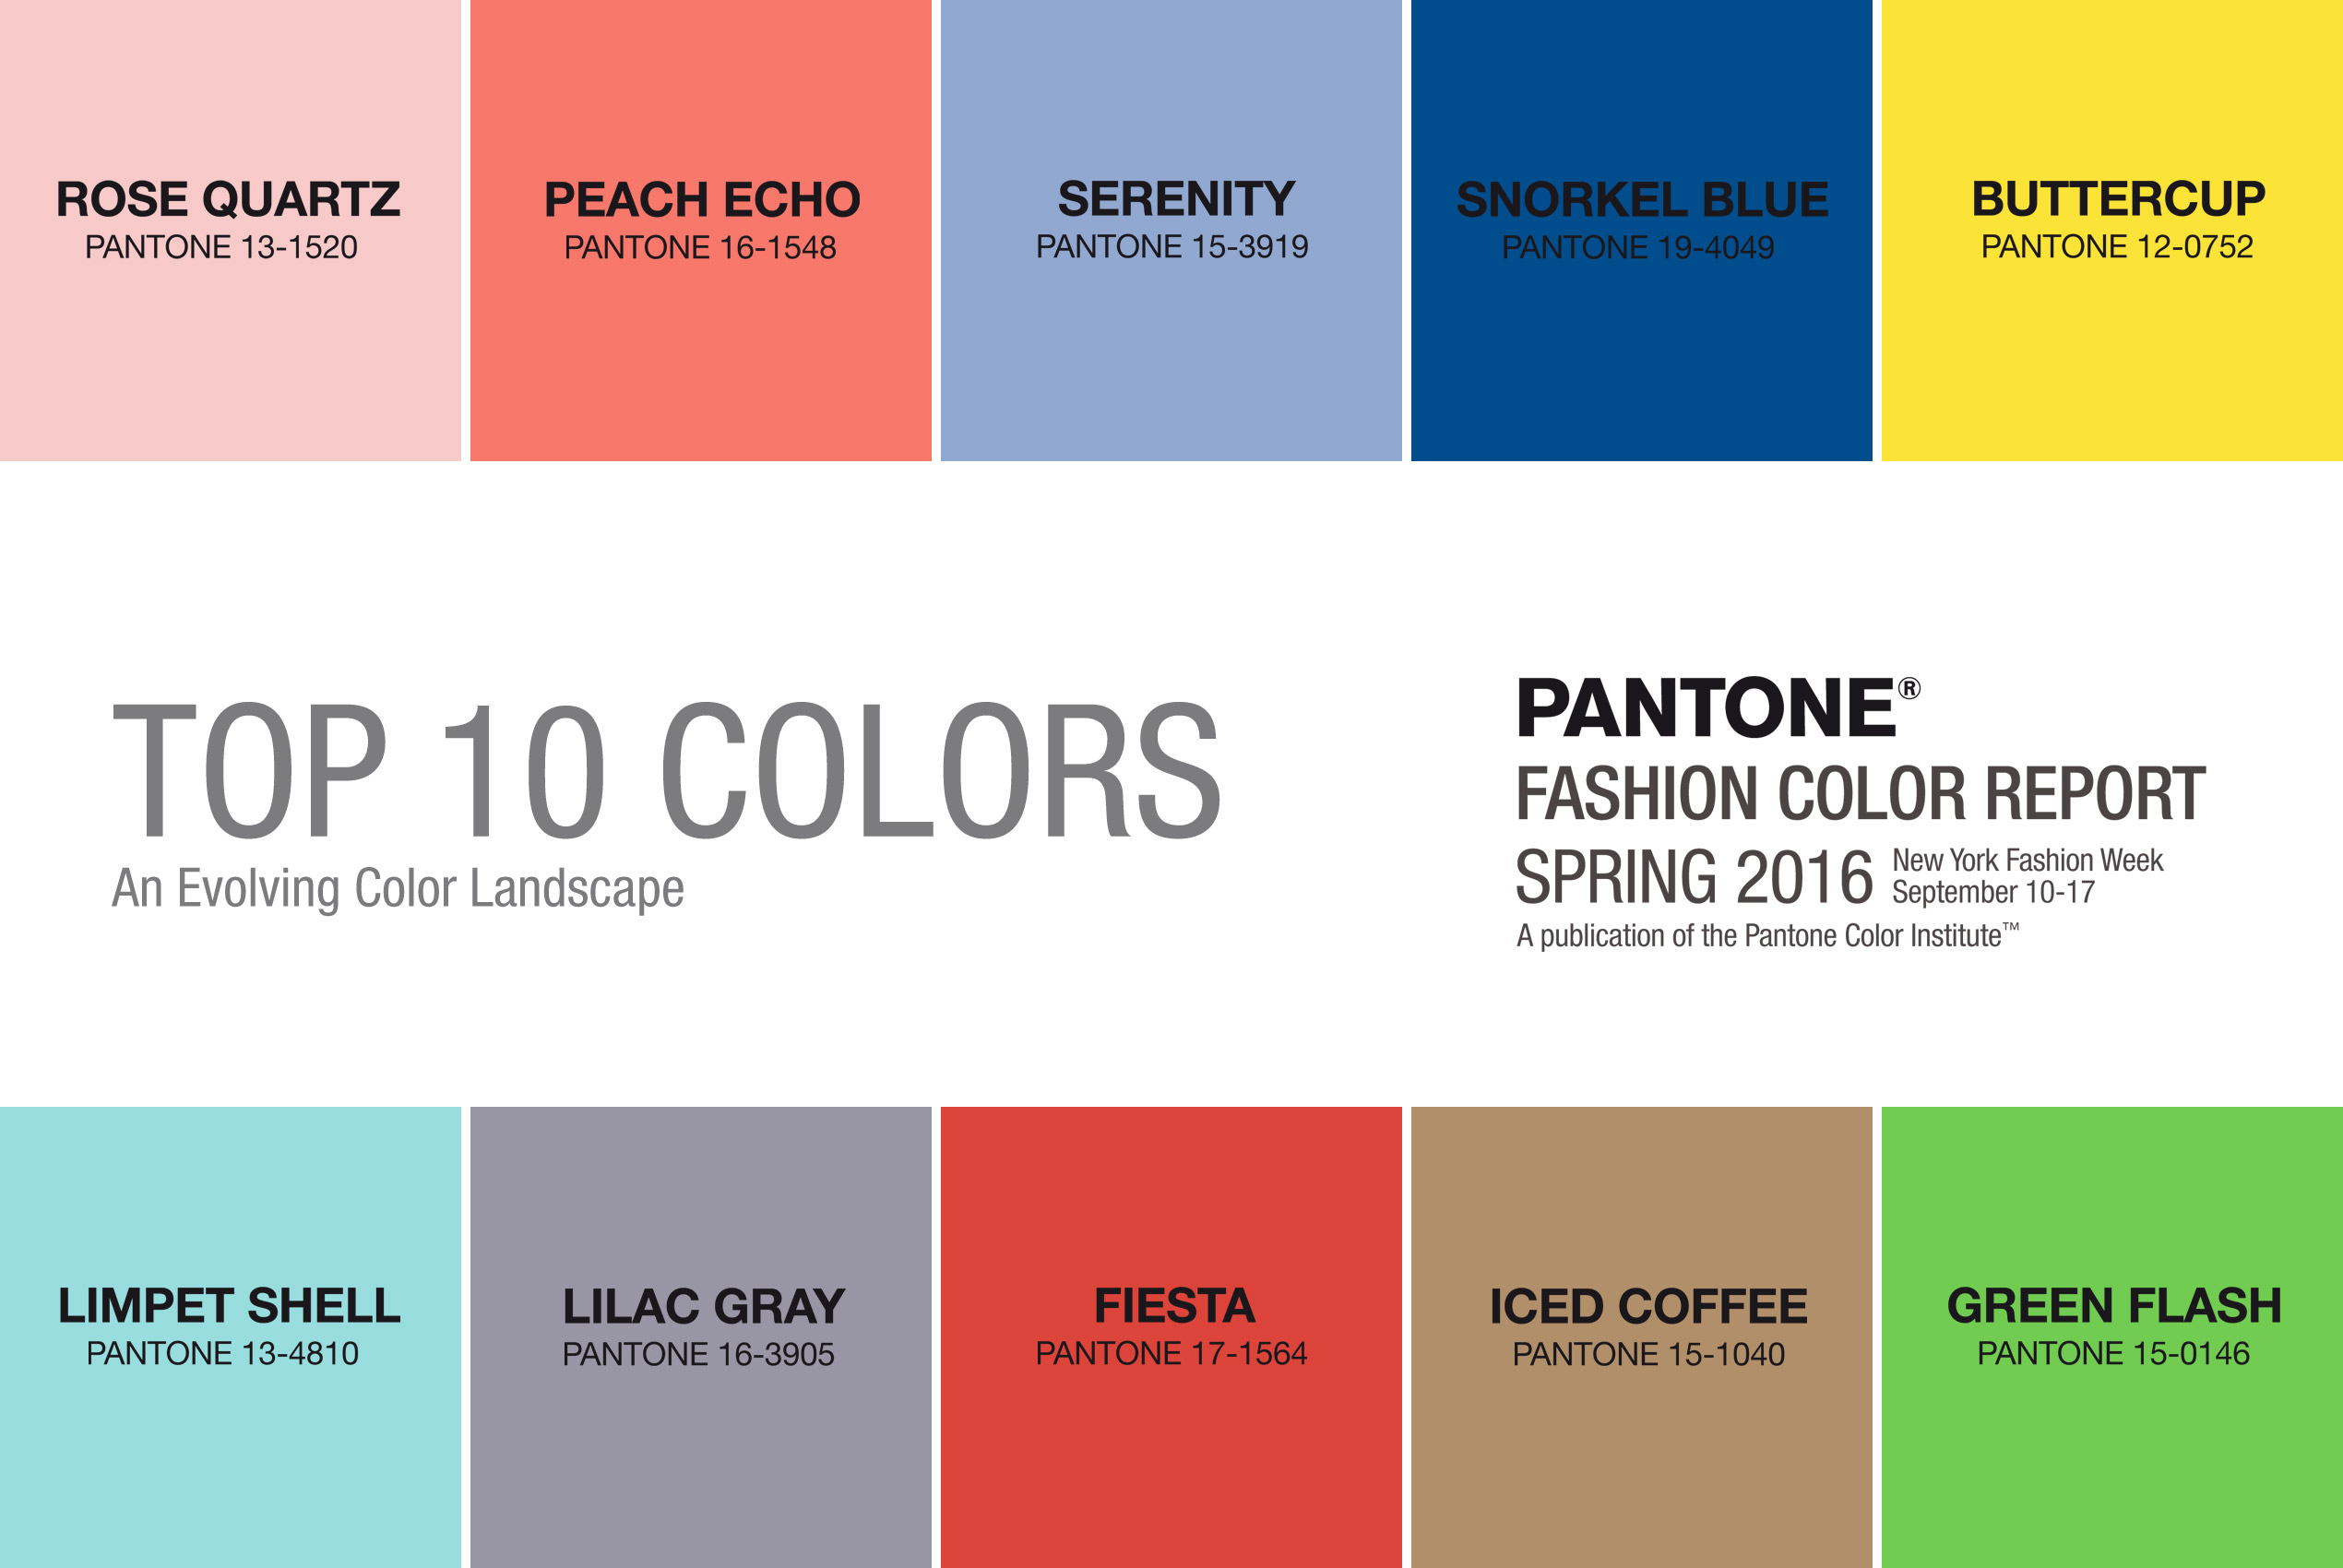 Top 10 trendy farieb pre jar a leto 2016 podľa Pantone.